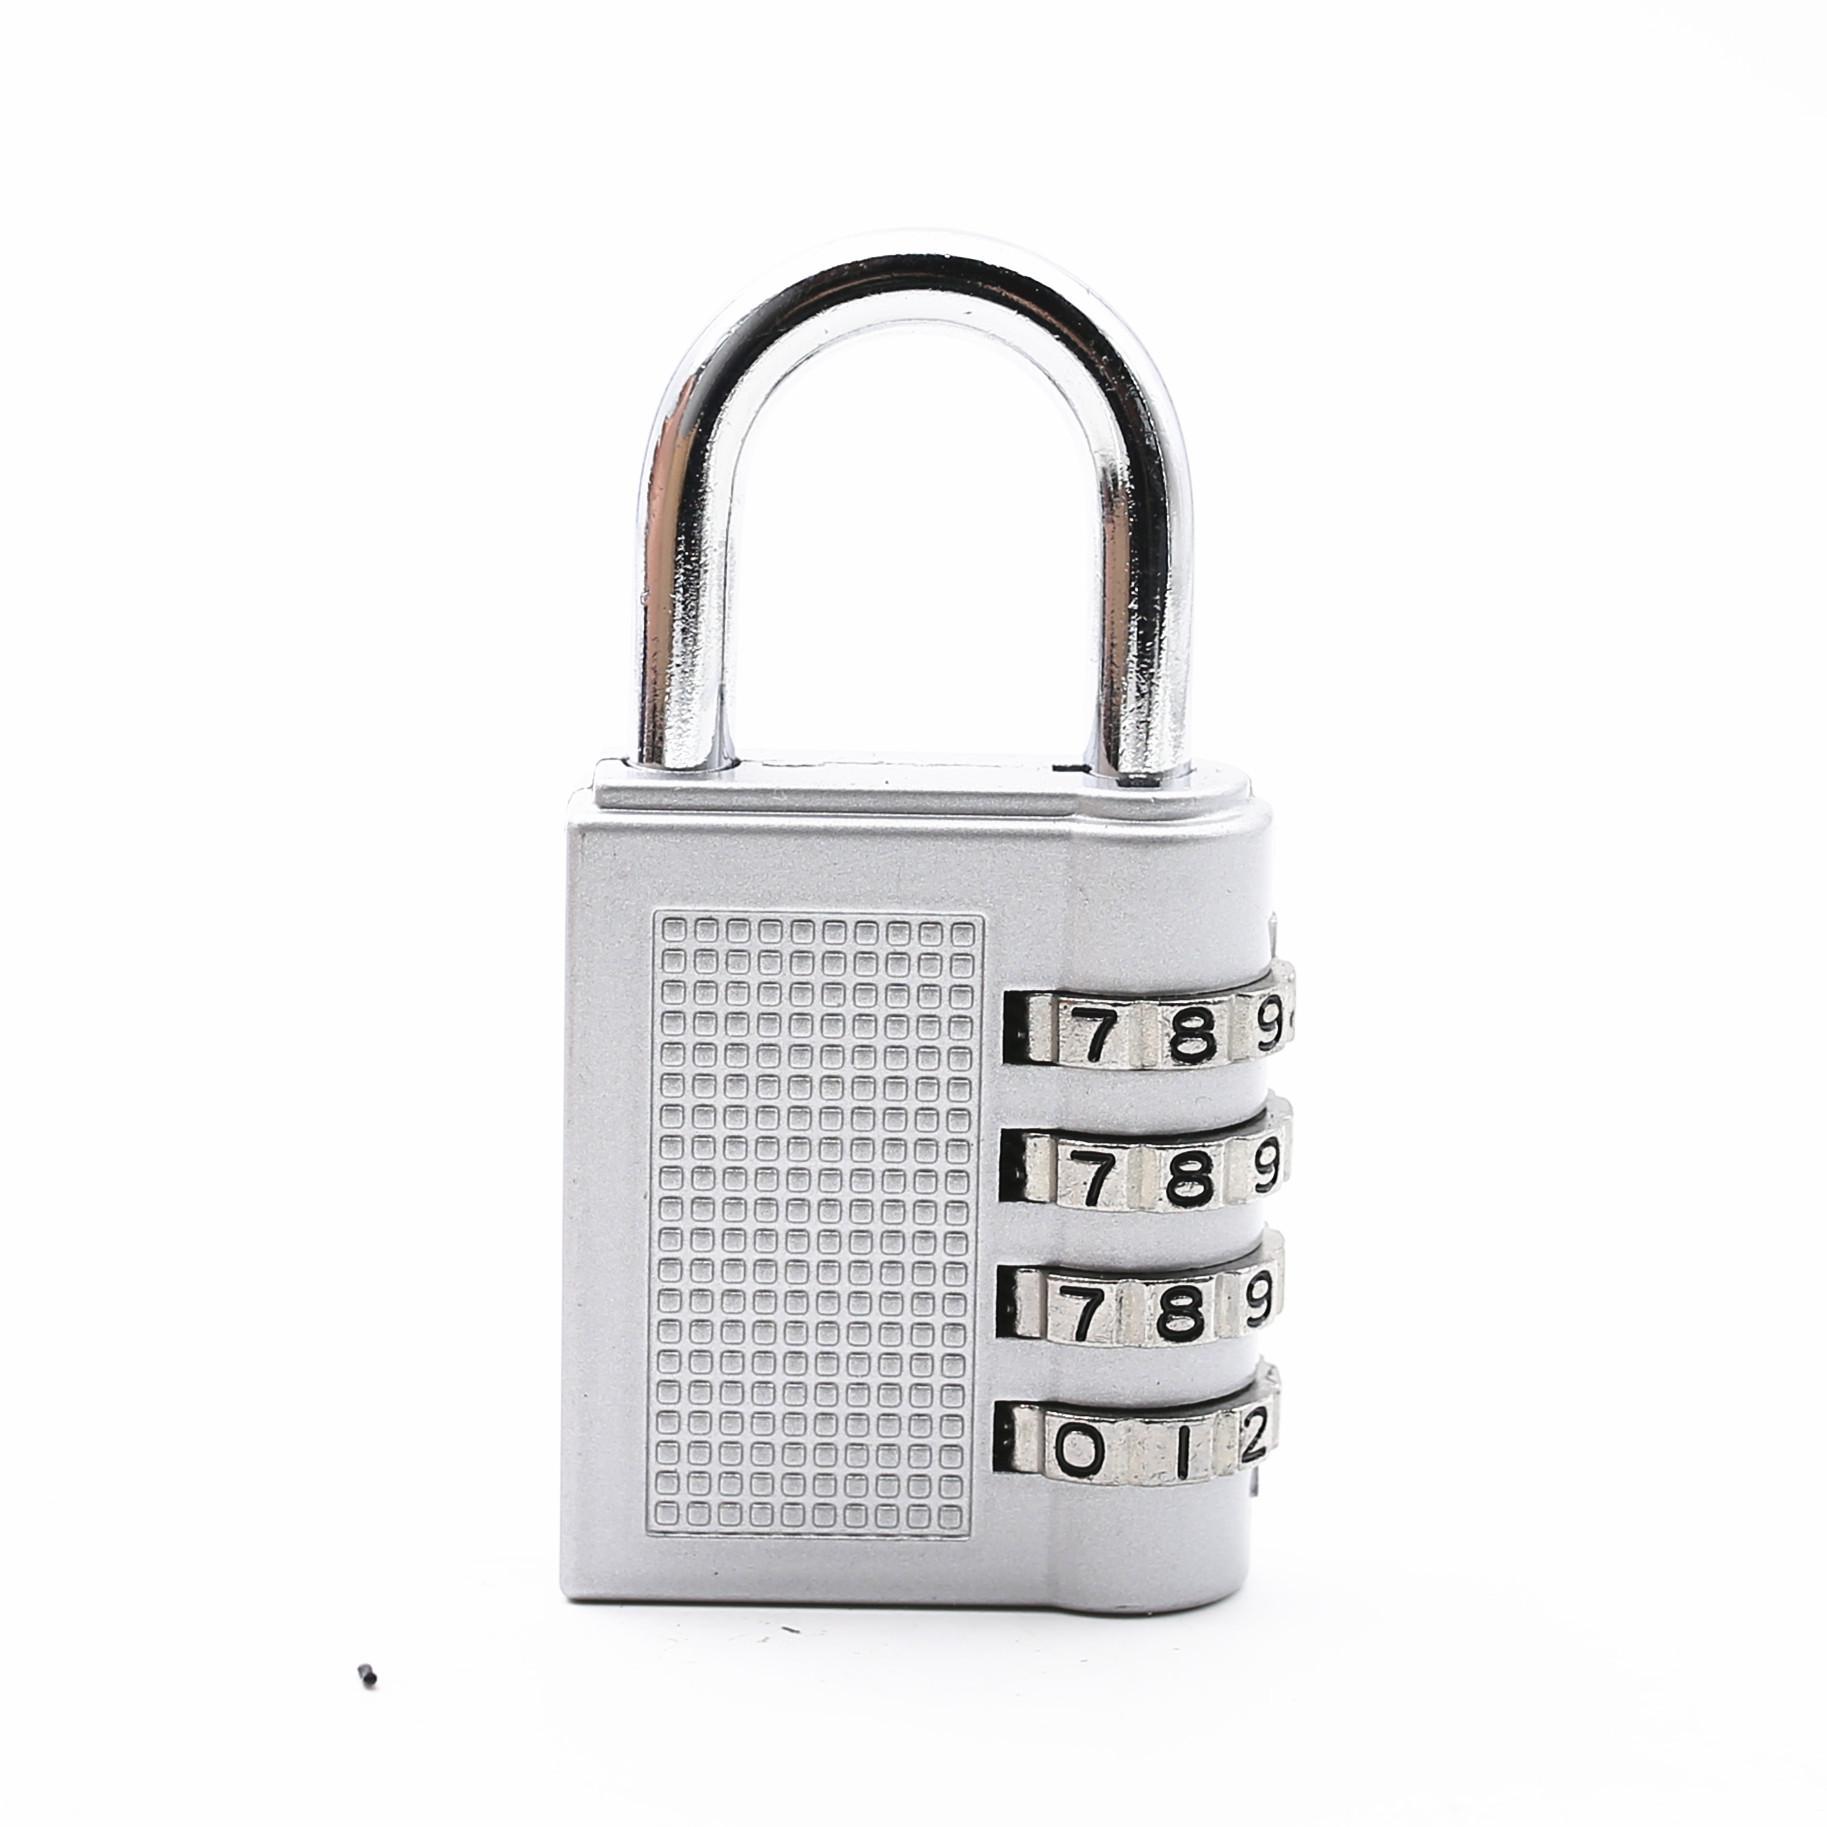 Dial Digit Combination Lock Suitcase Luggage Password Lock Padlock  Home Dormitory Silver